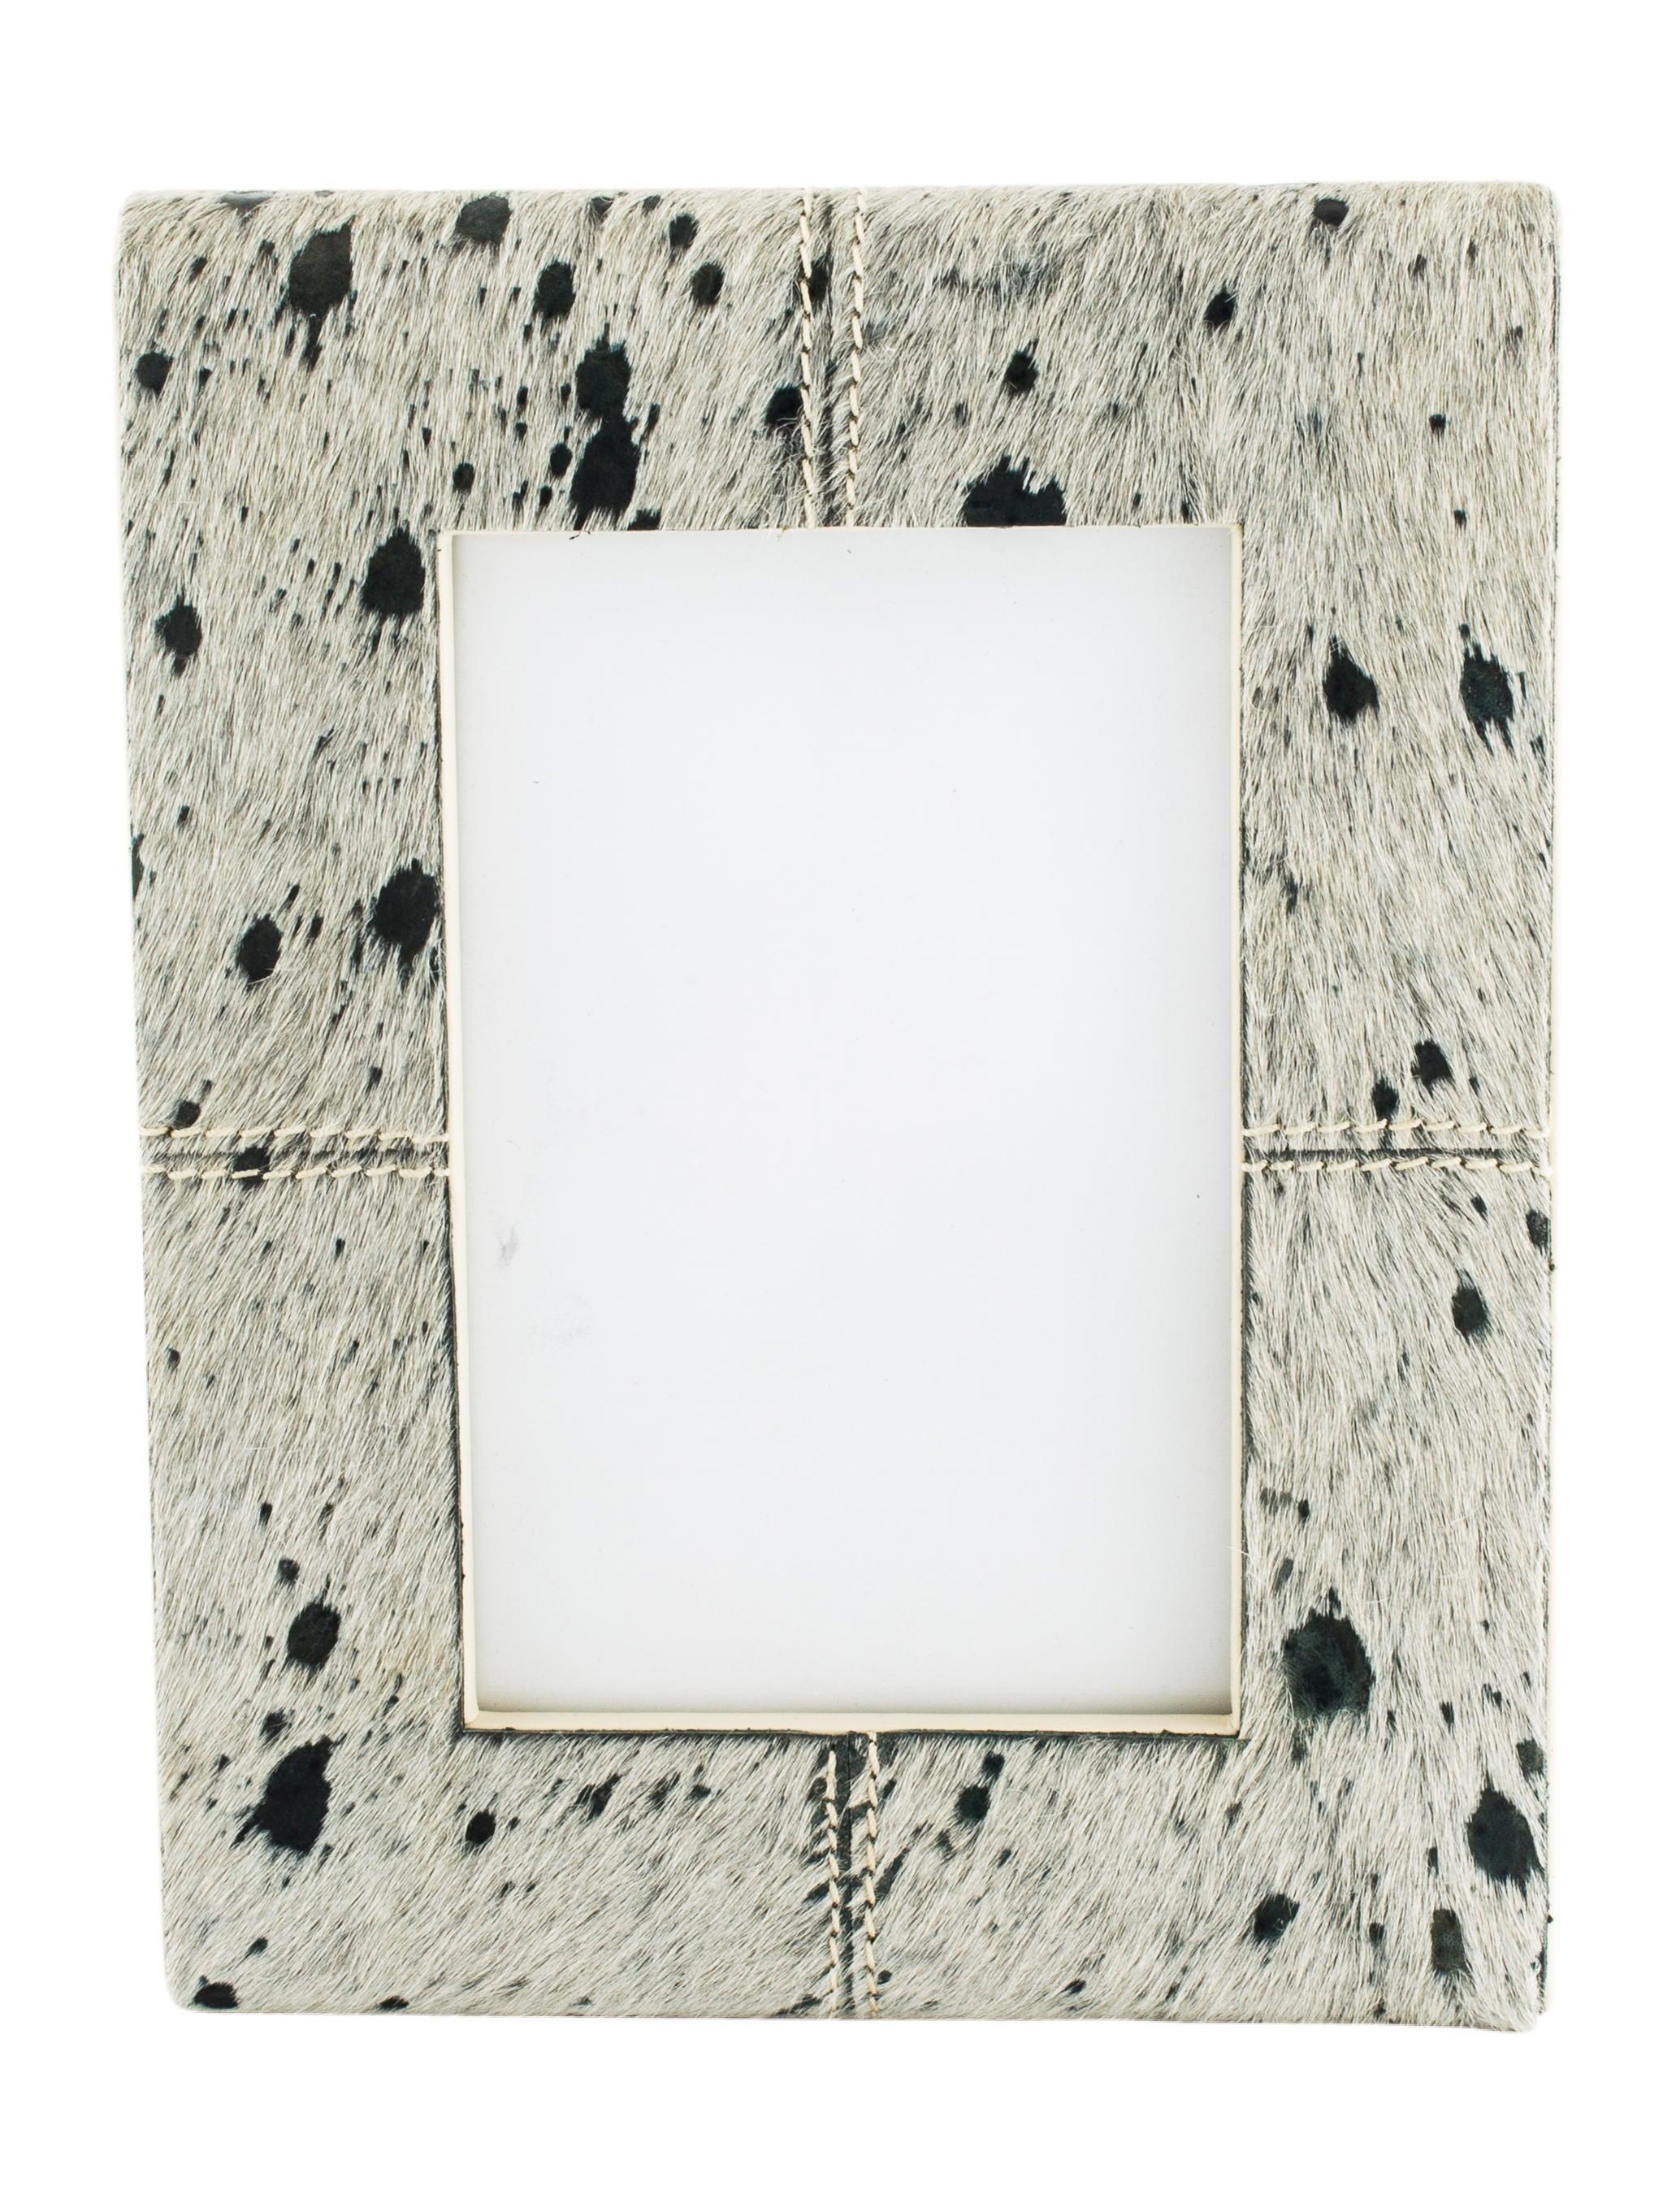 Tahari Faux Fur Picture Frame - Decor And Accessories - WTAHI20087 ...